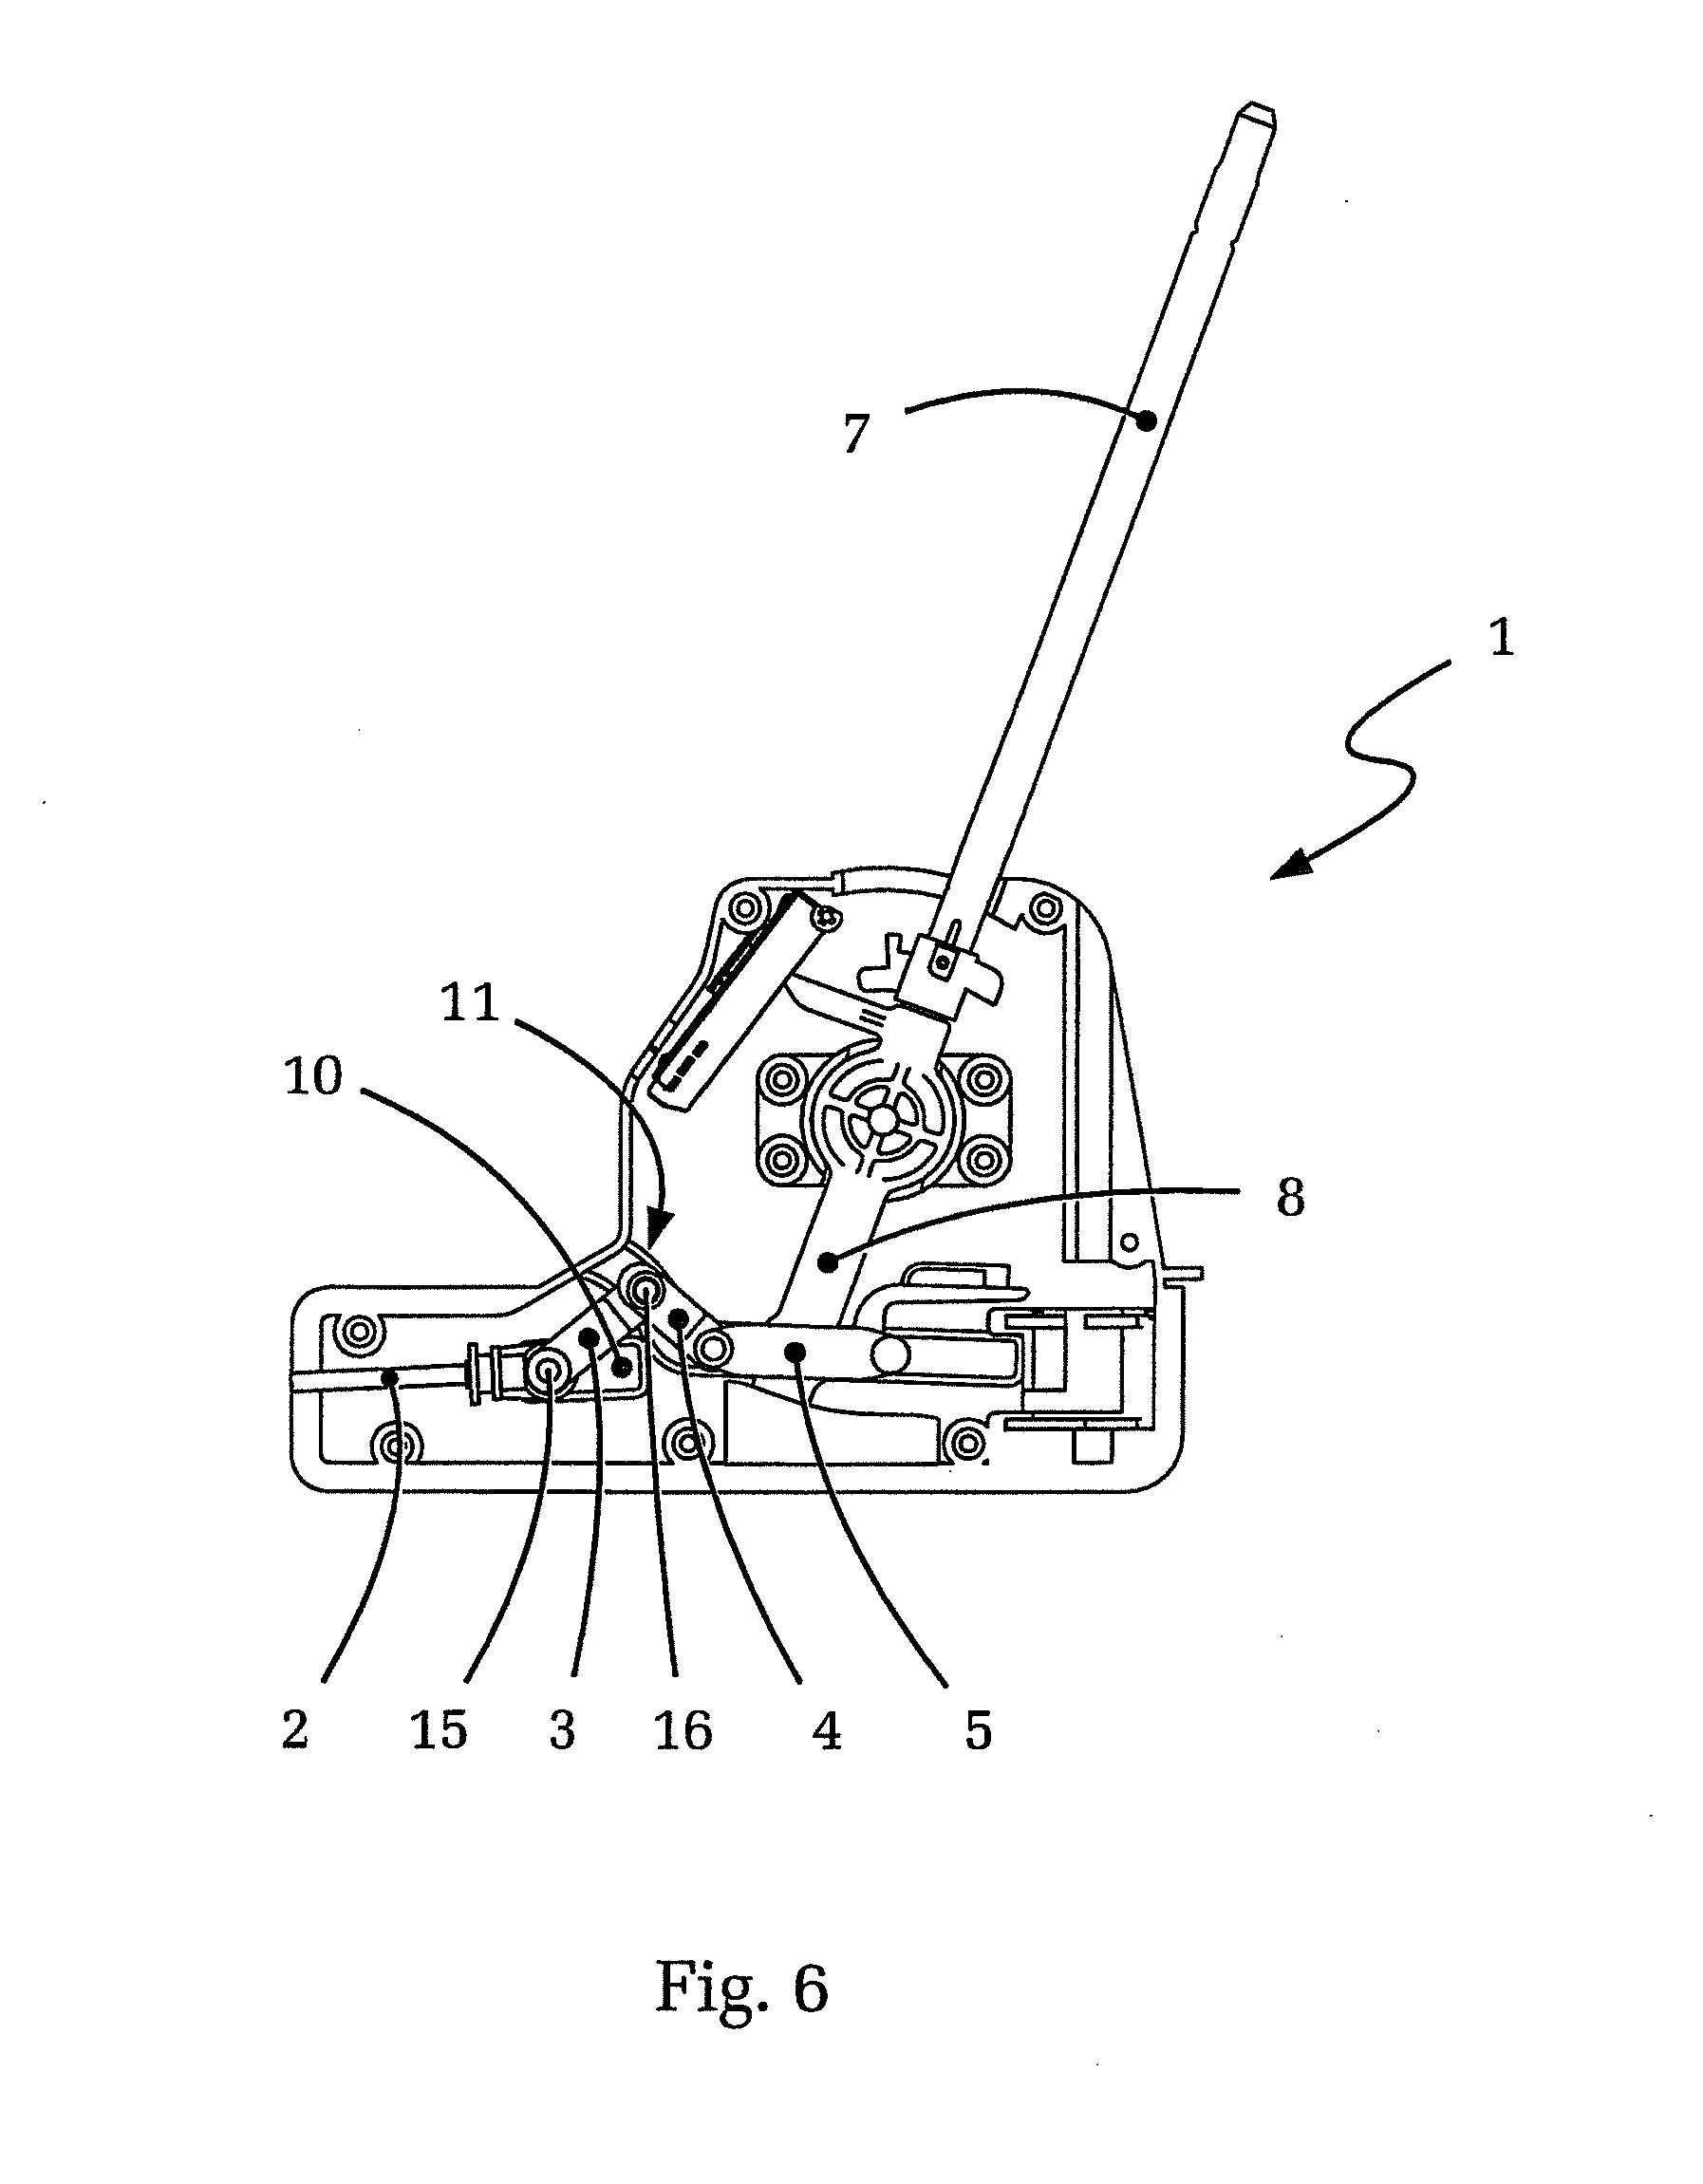 Haldex abs wiring diagram wiring diagram and schematics us20120111134a1 20120510 d00006 haldex abs wiring diagram